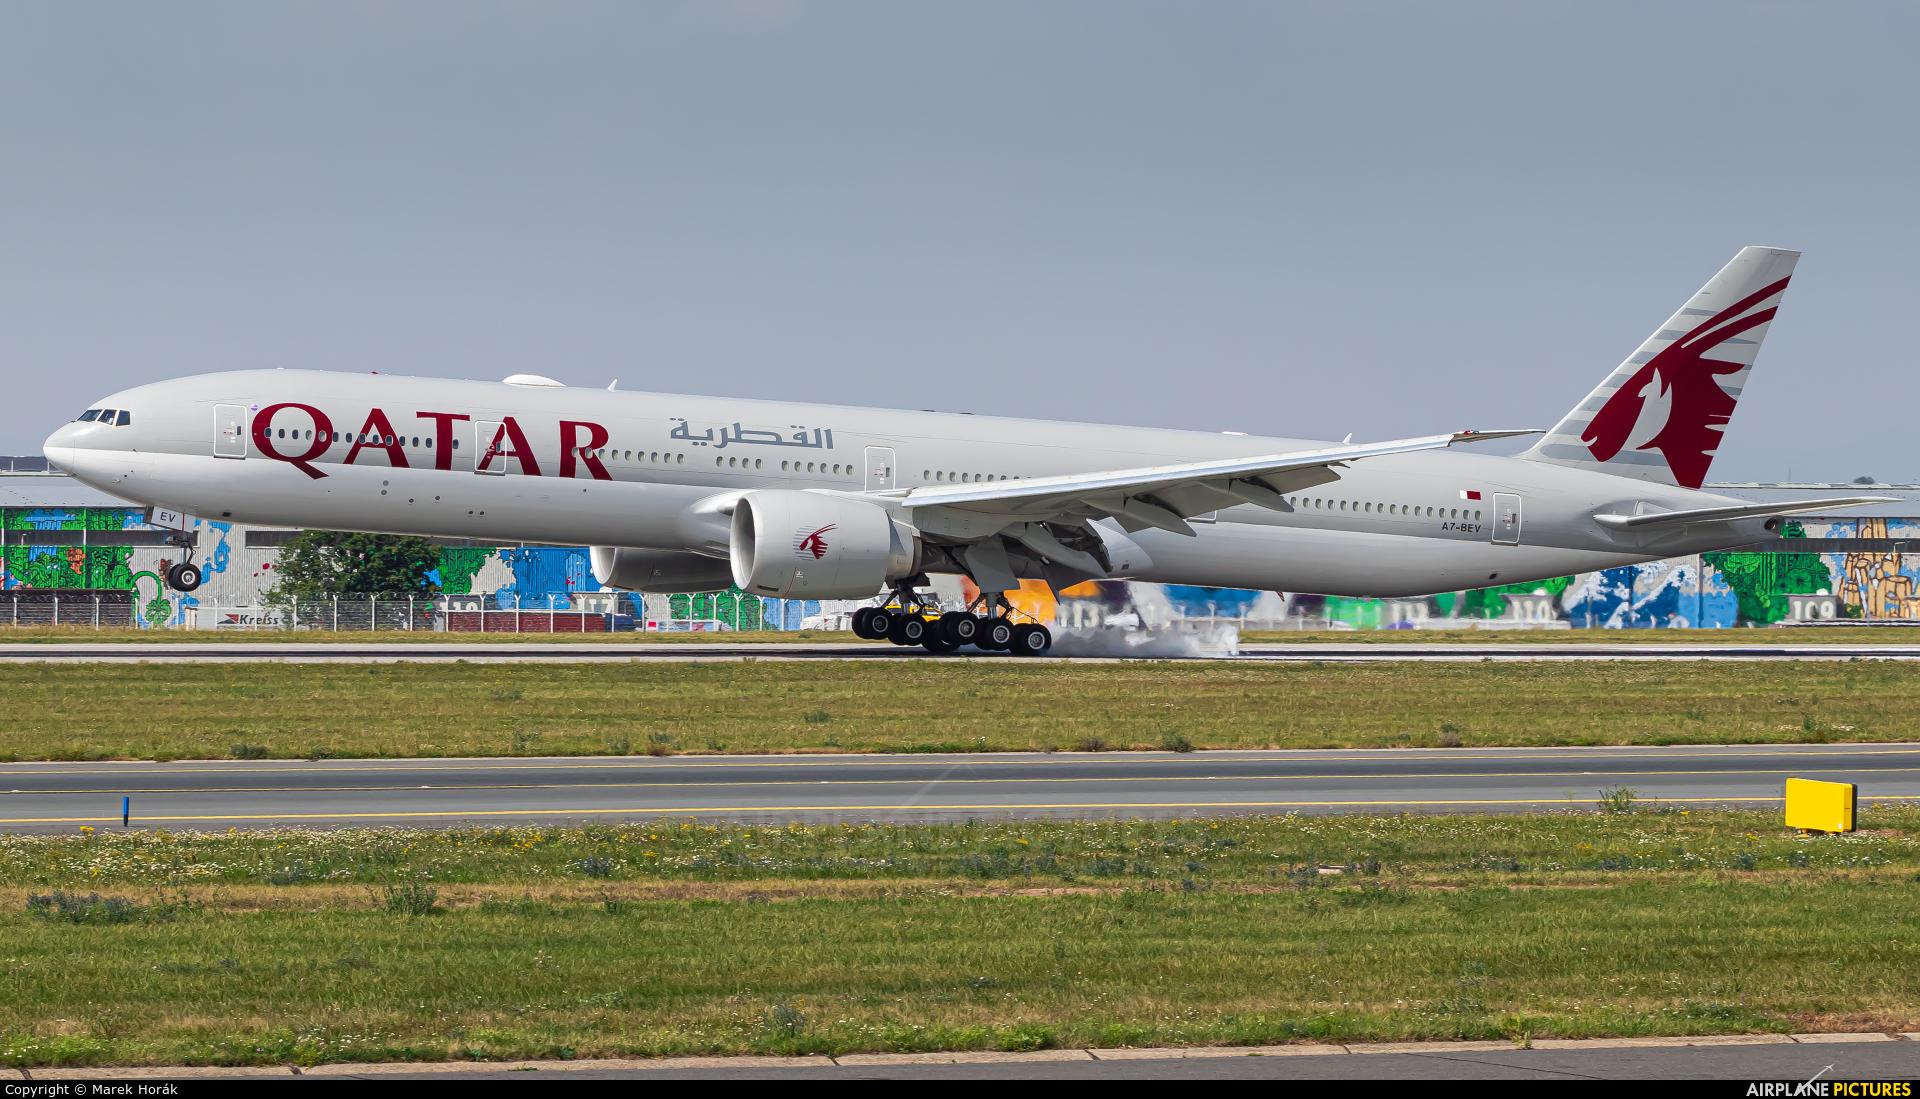 Qatar Airways A7-BEV aircraft at Prague - Václav Havel